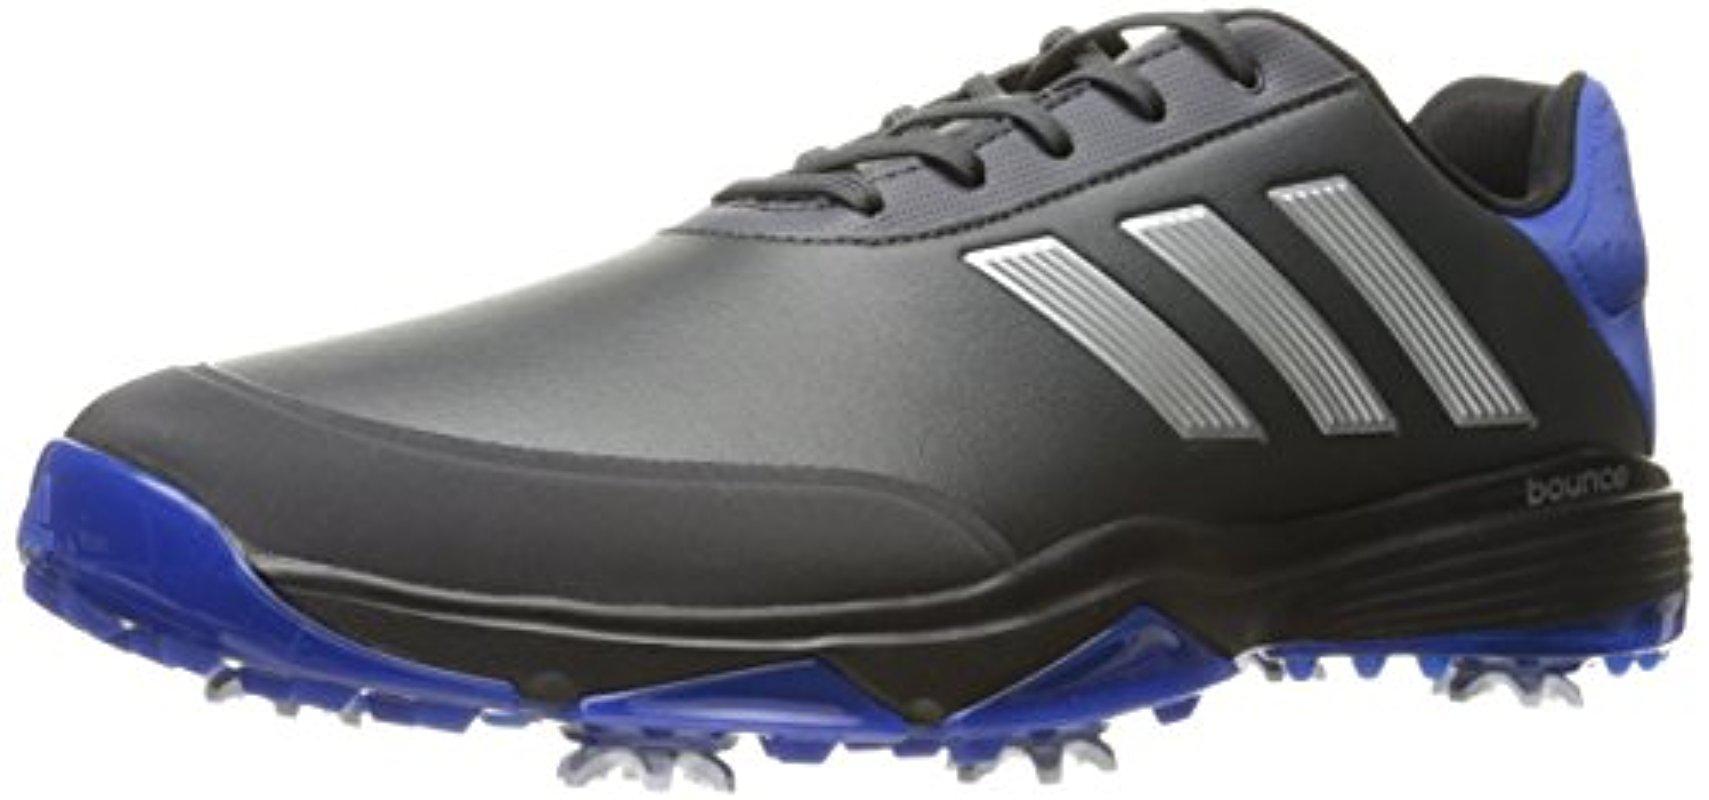 Lyst Adidas Adipower Bounce WD zapato de golf de carbono en negro para hombres